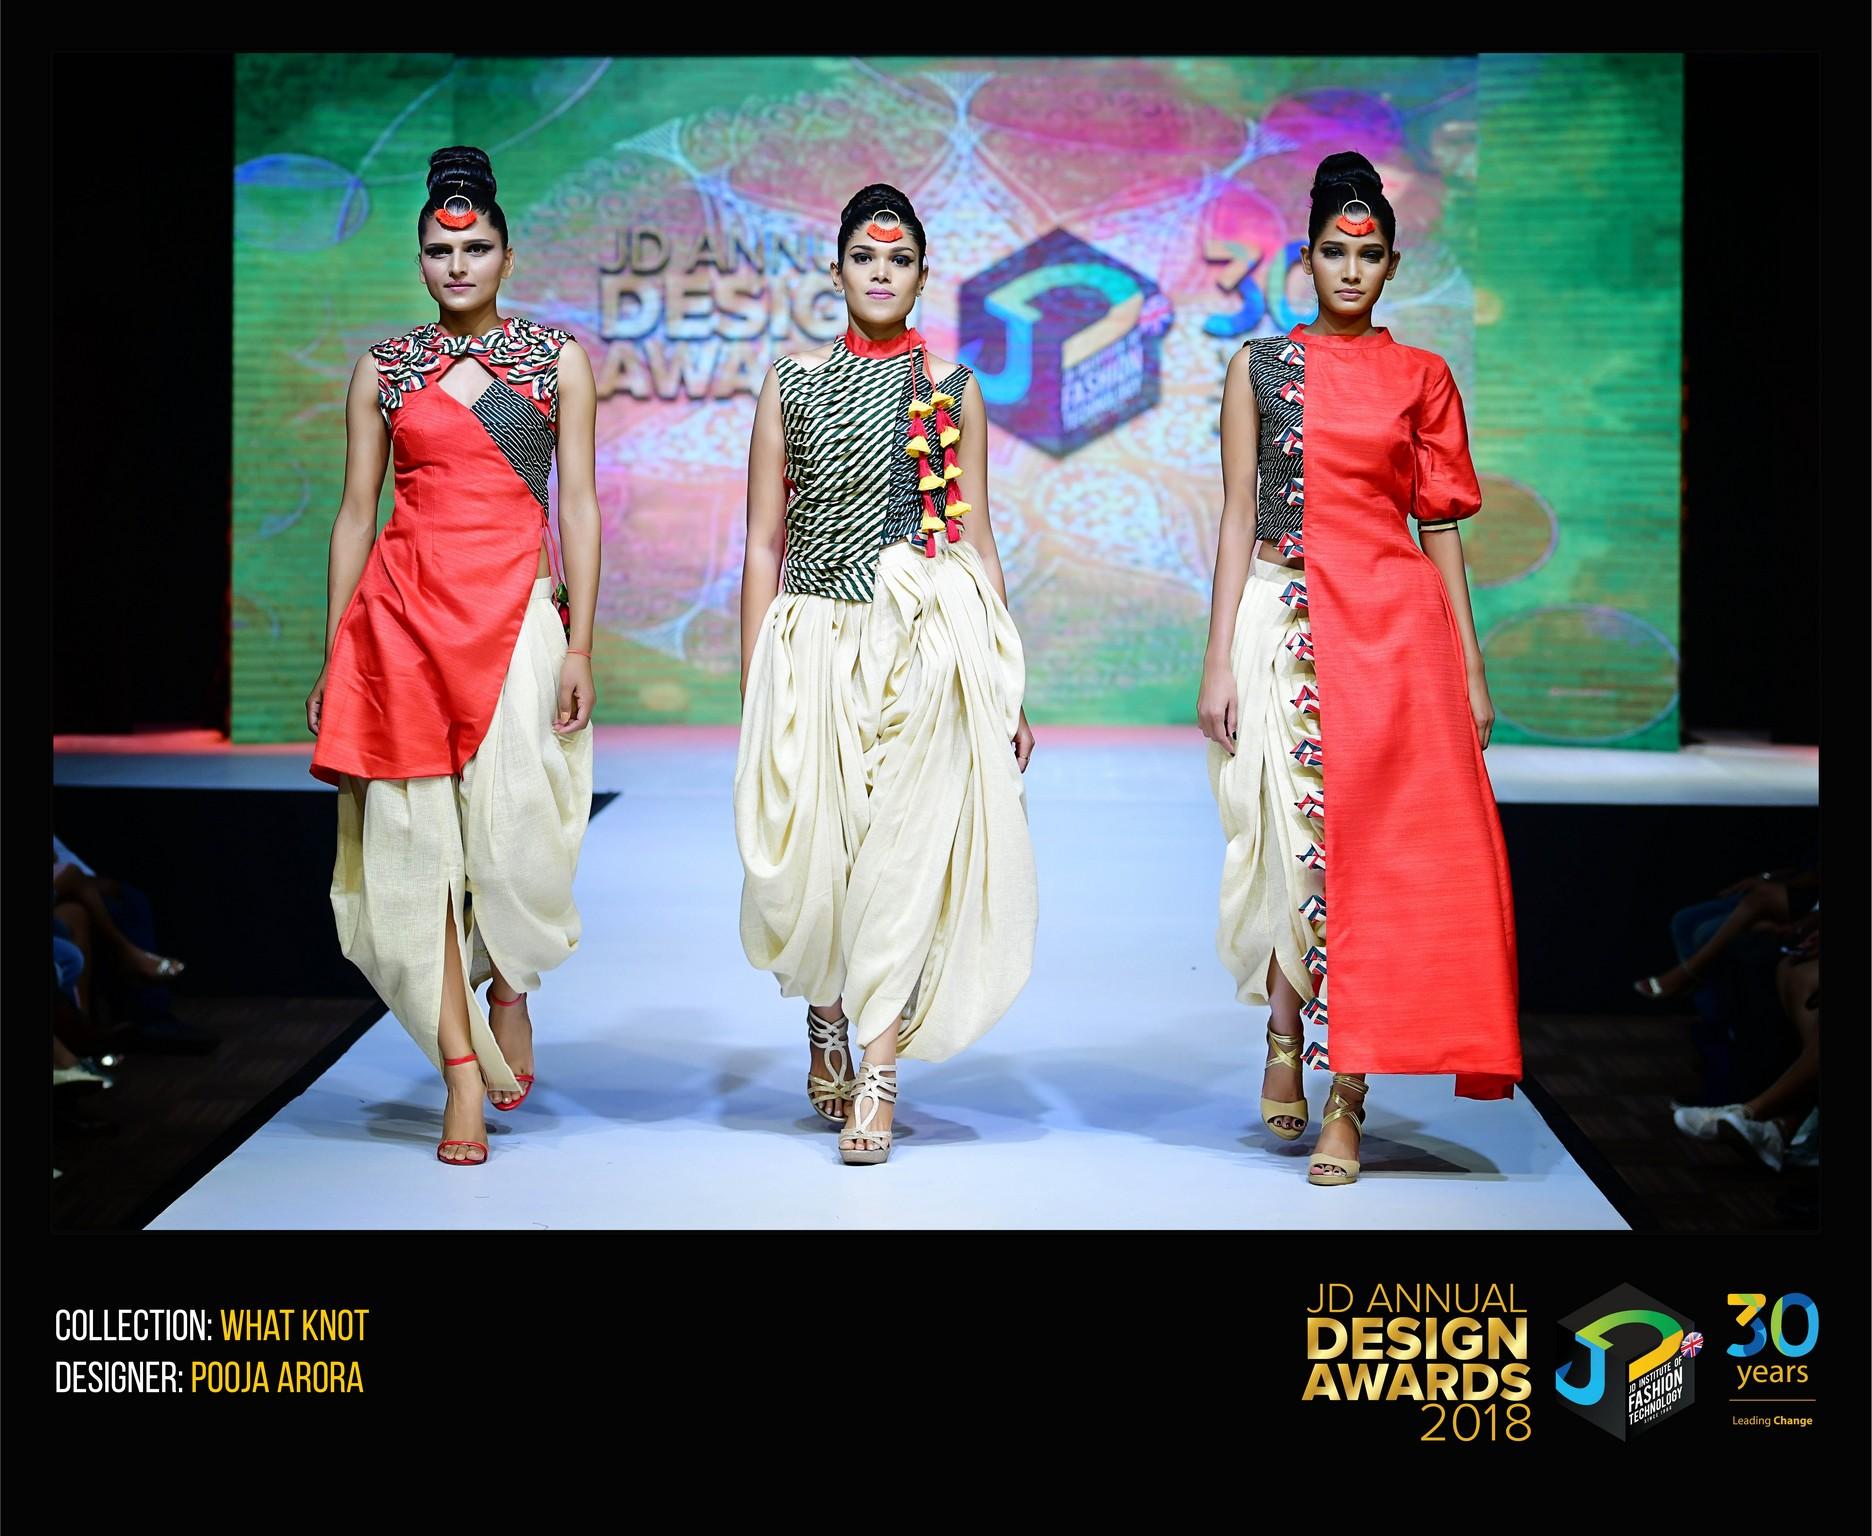 What Knot - Change - JDAnnual Design Awards 2018 | Designer: Naailah, Reema, Shreya | Photography : Jerin Nath (@jerin_nath) what knot - change - jdannual design awards 2018 - WHAT KNOT 3 - What Knot – Change – JDAnnual Design Awards 2018